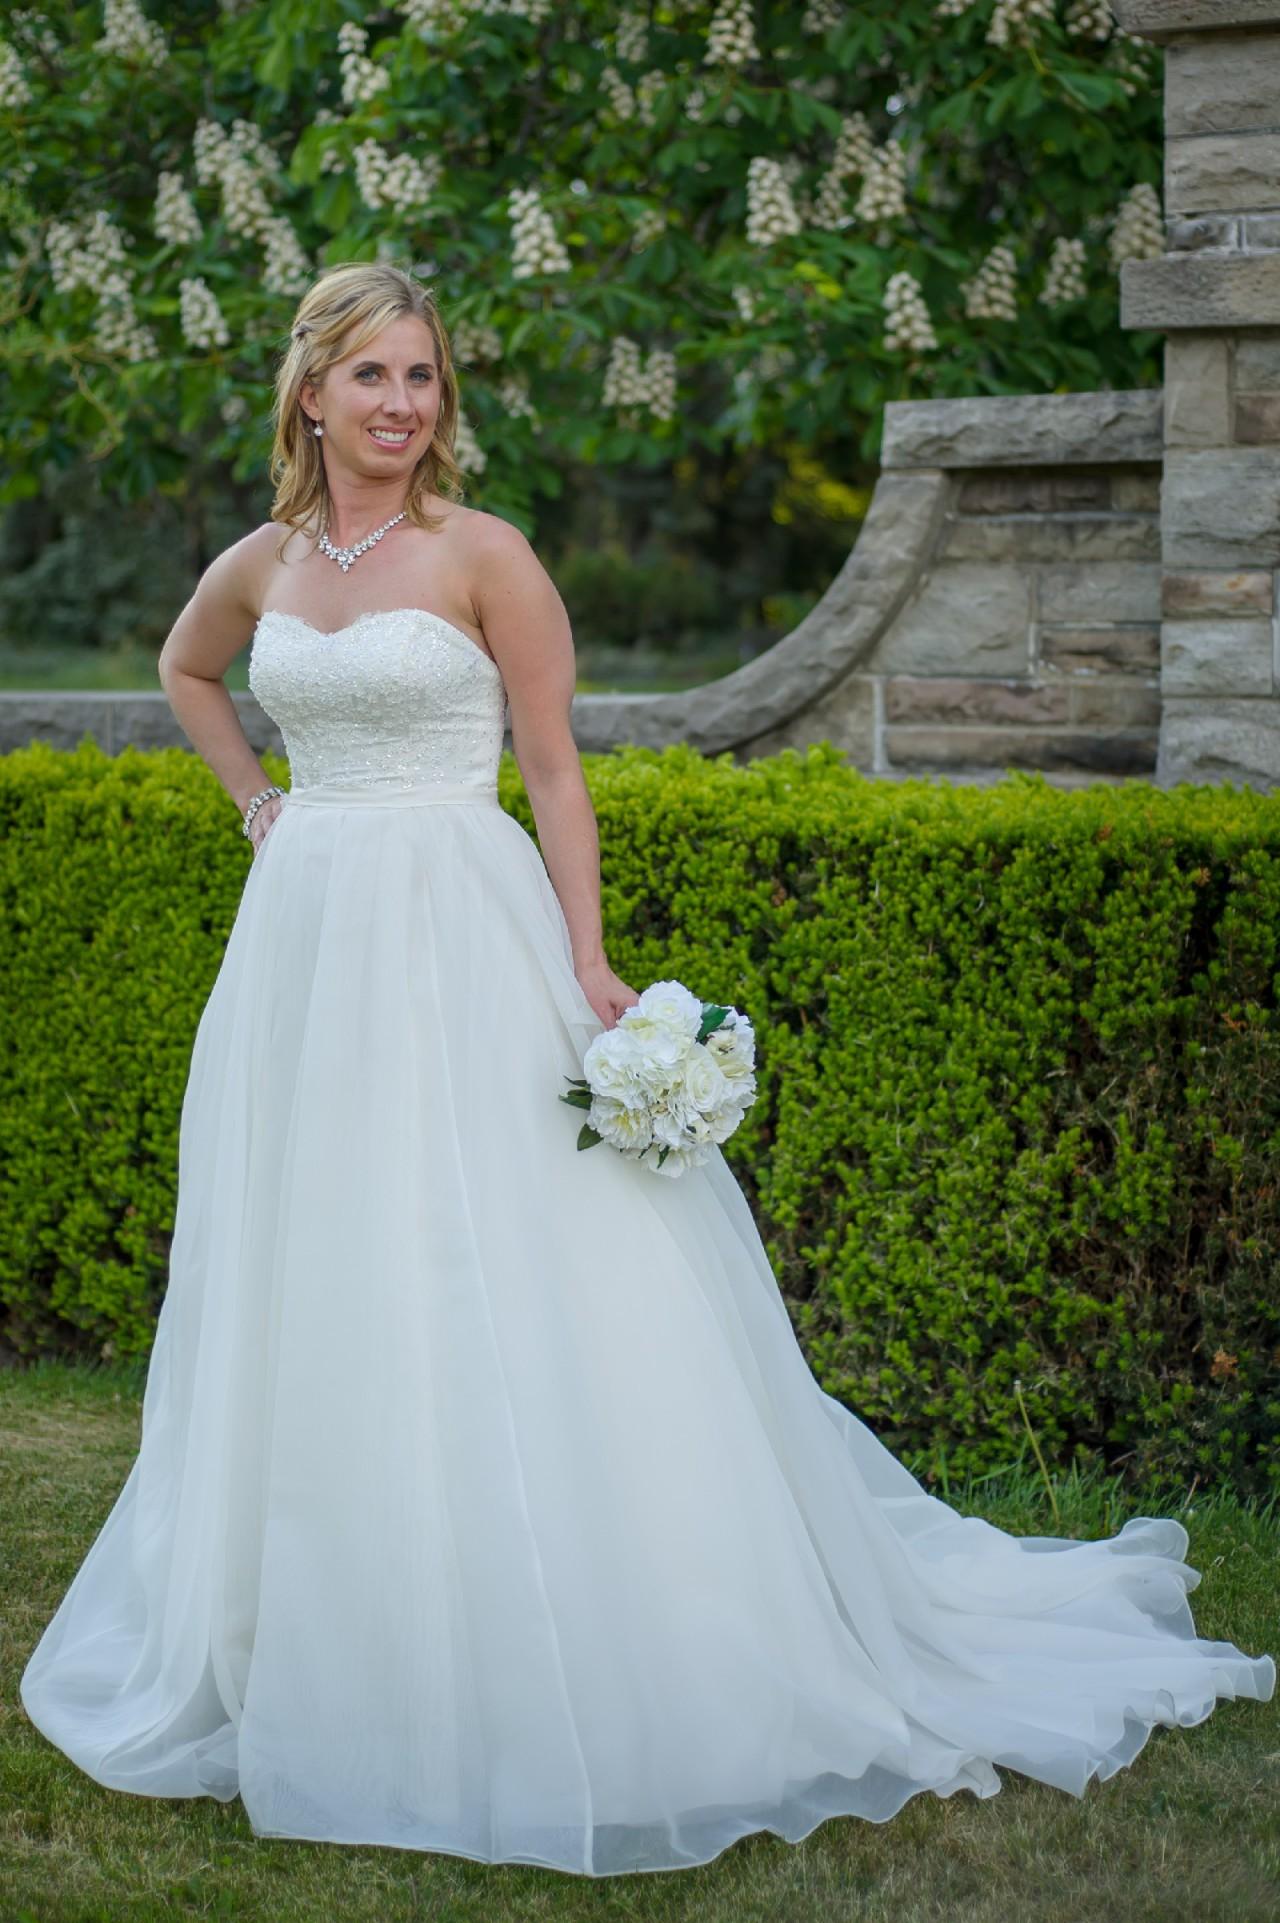 Oleg Cassini CWG731 Preowned Wedding Dress on Sale 36% Off